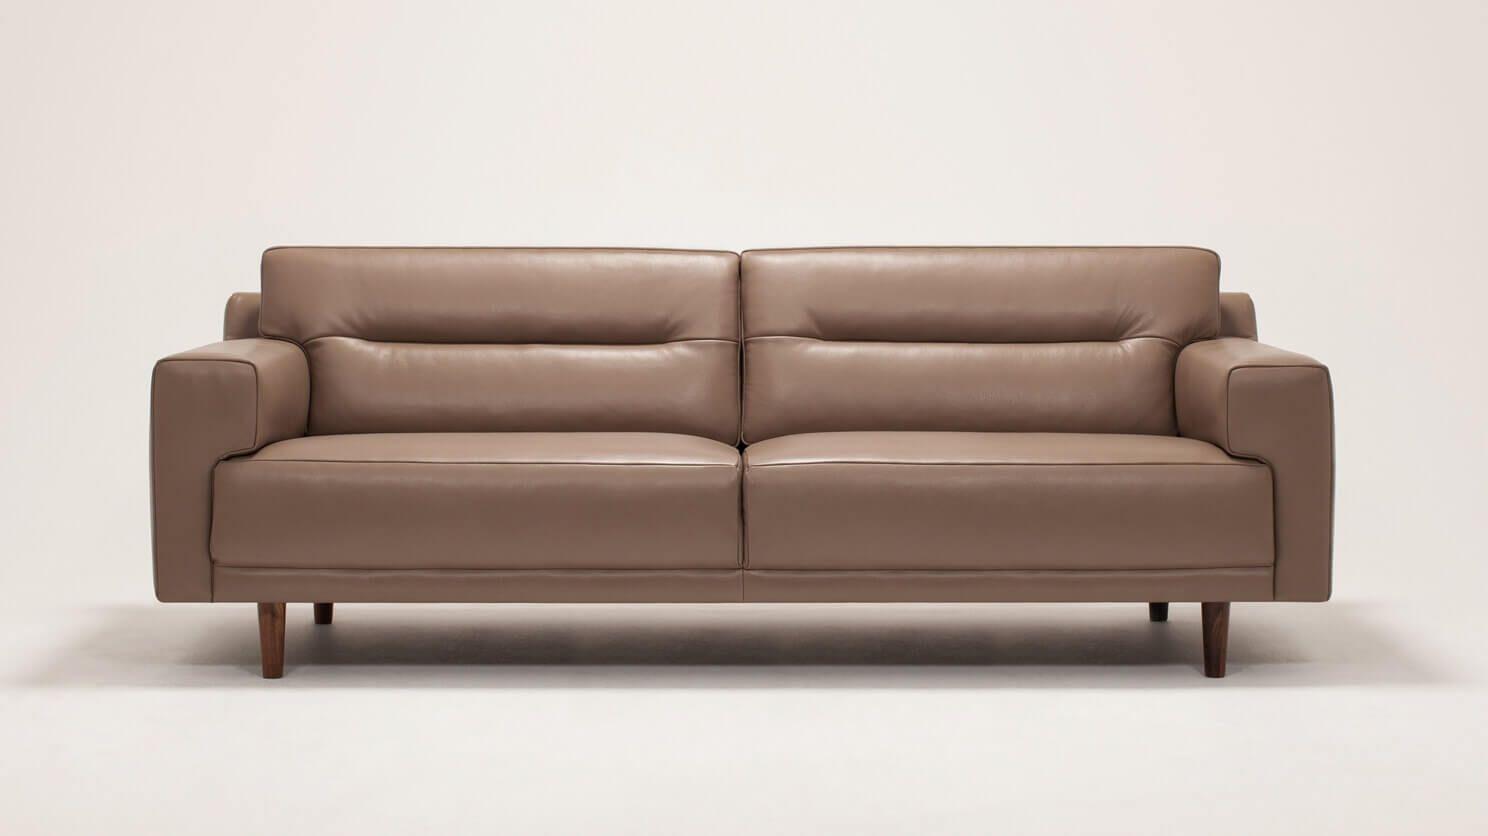 Remi Sofa Eq3 In 2020 Leather Sofa Furniture Leather Loveseat